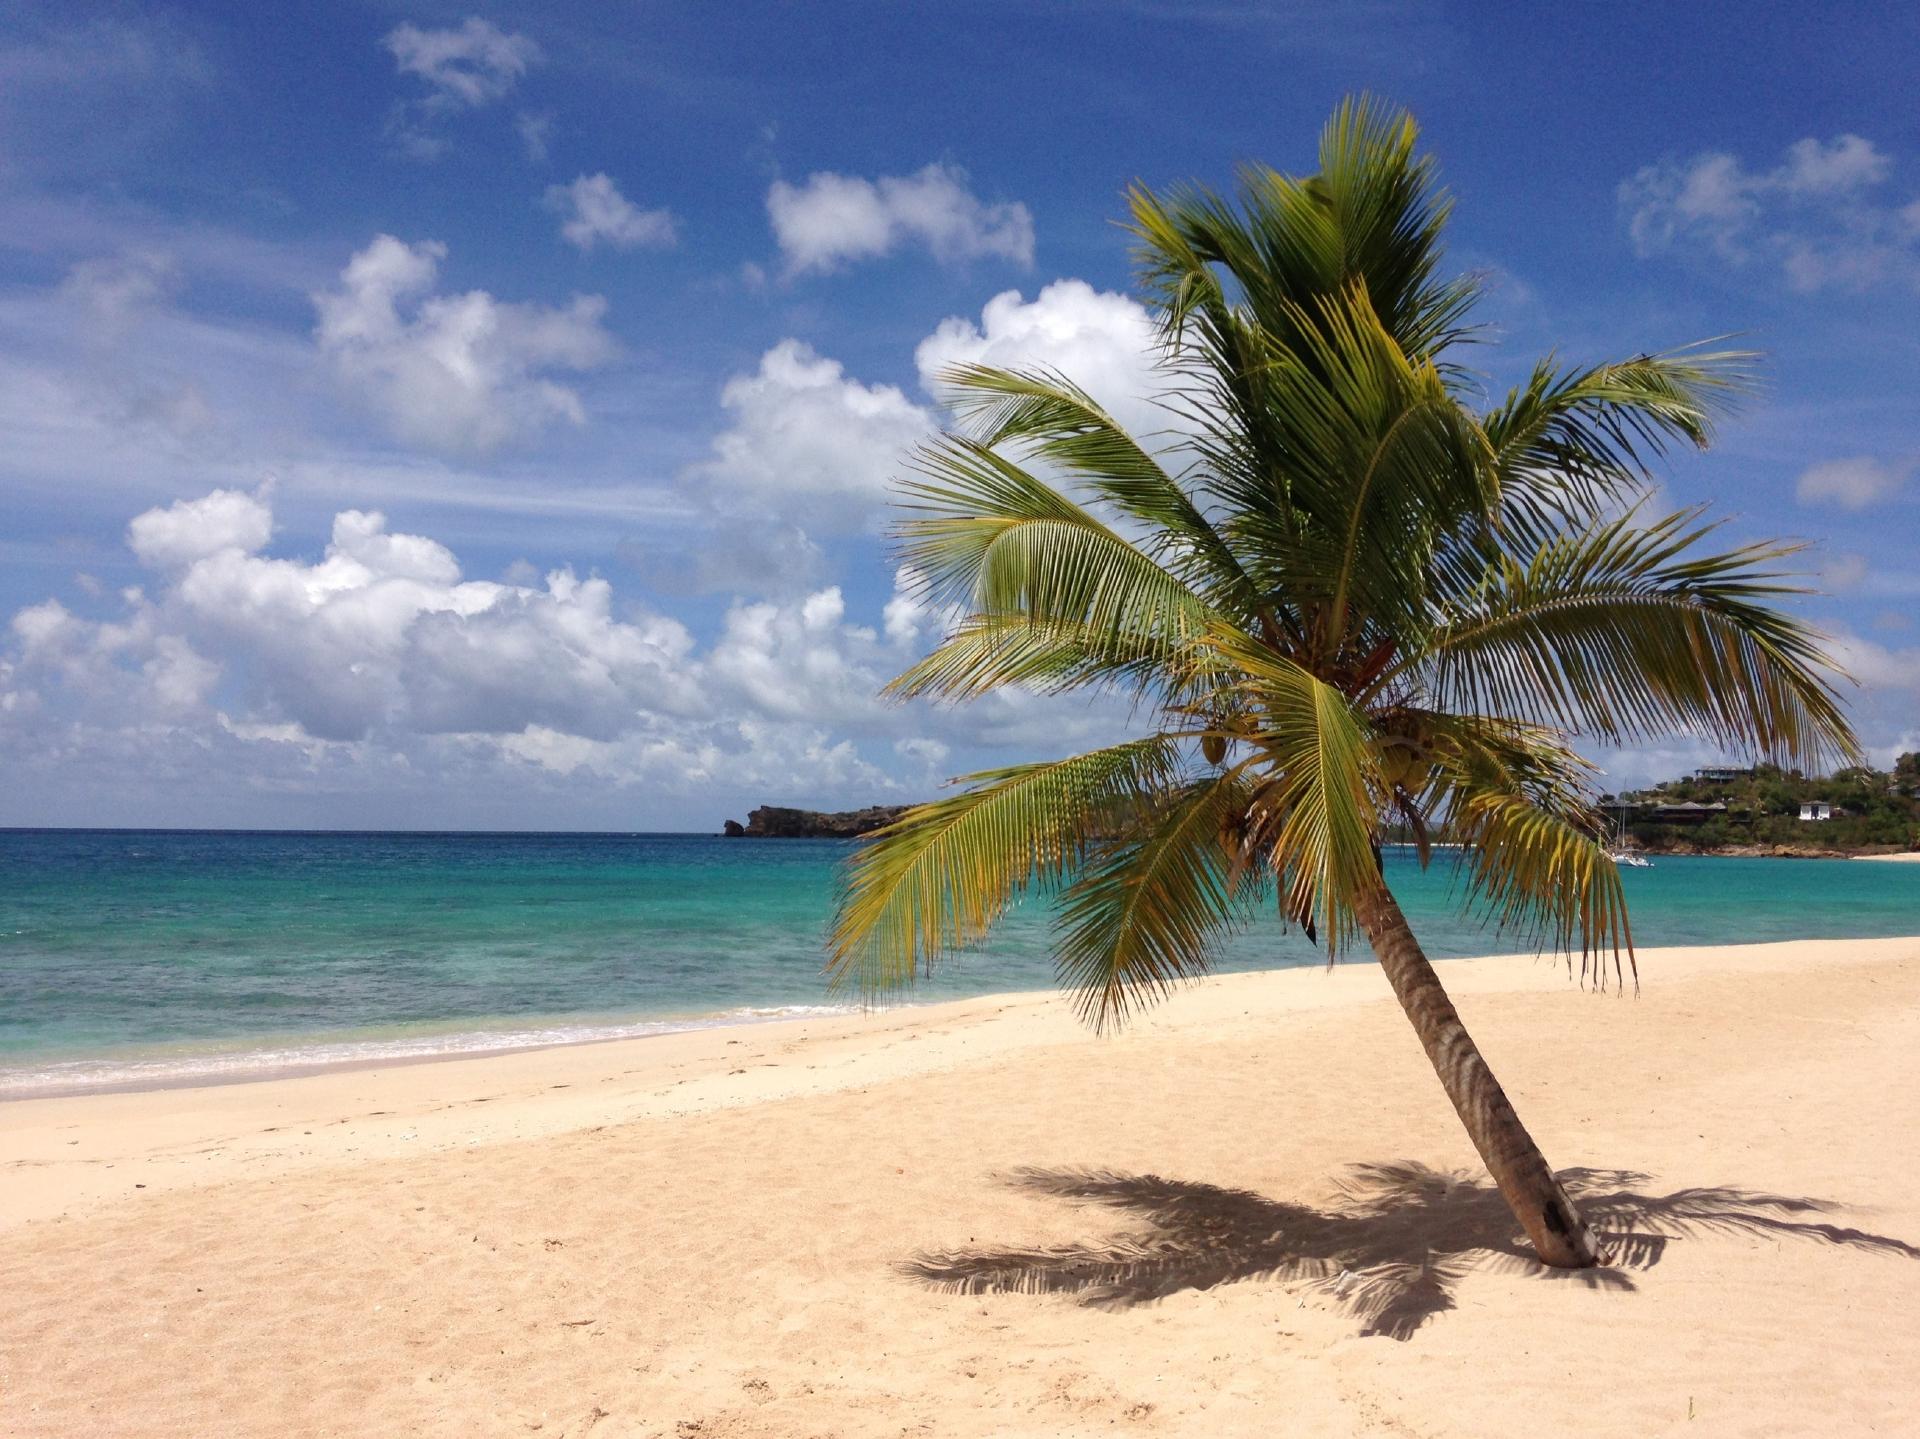 Palm tree on a beach in Antigua.